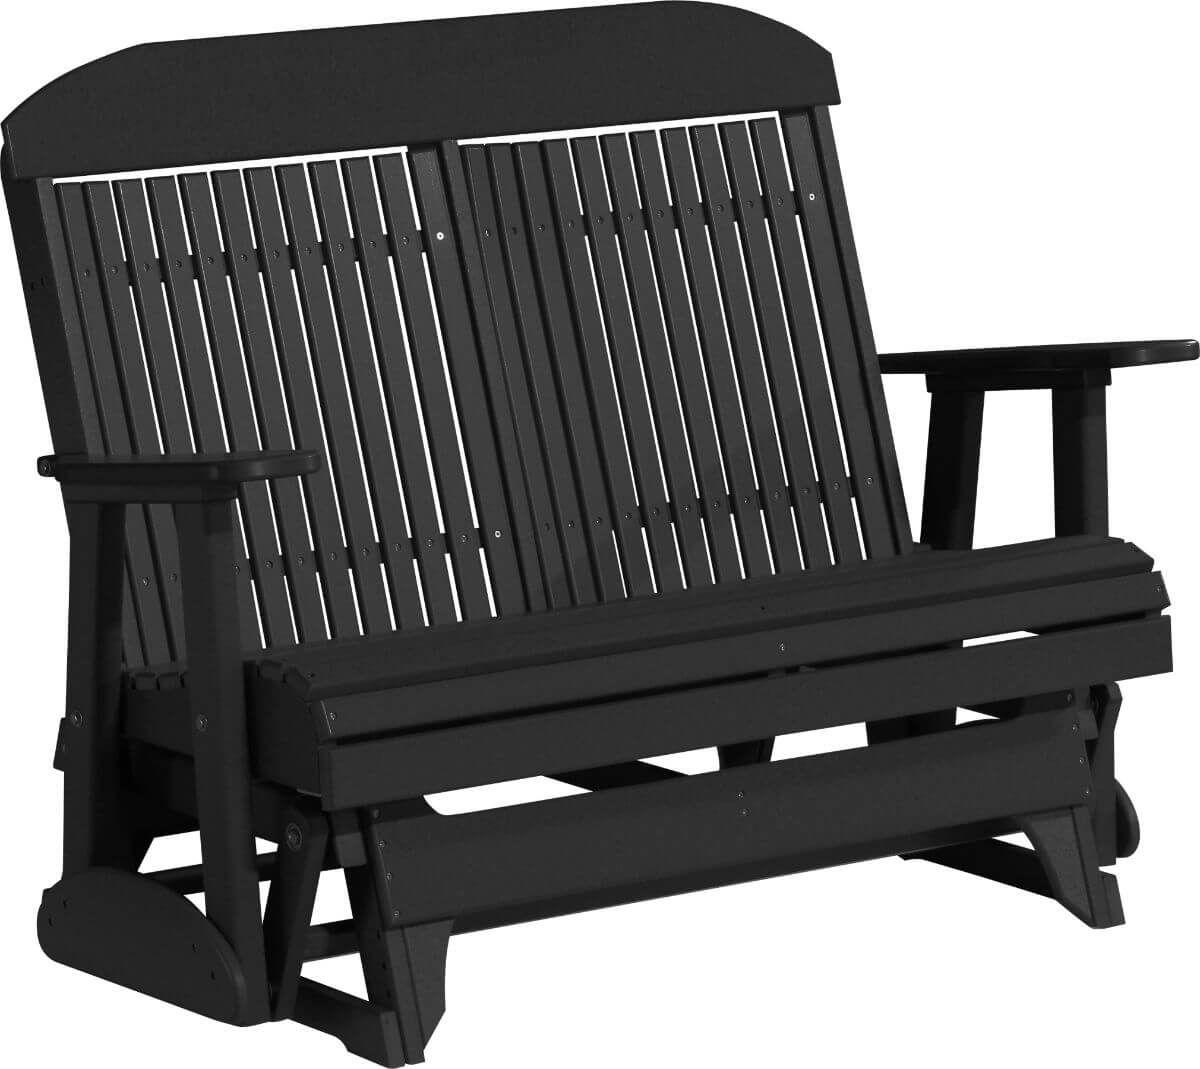 Black Stockton Outdoor Glider Bench